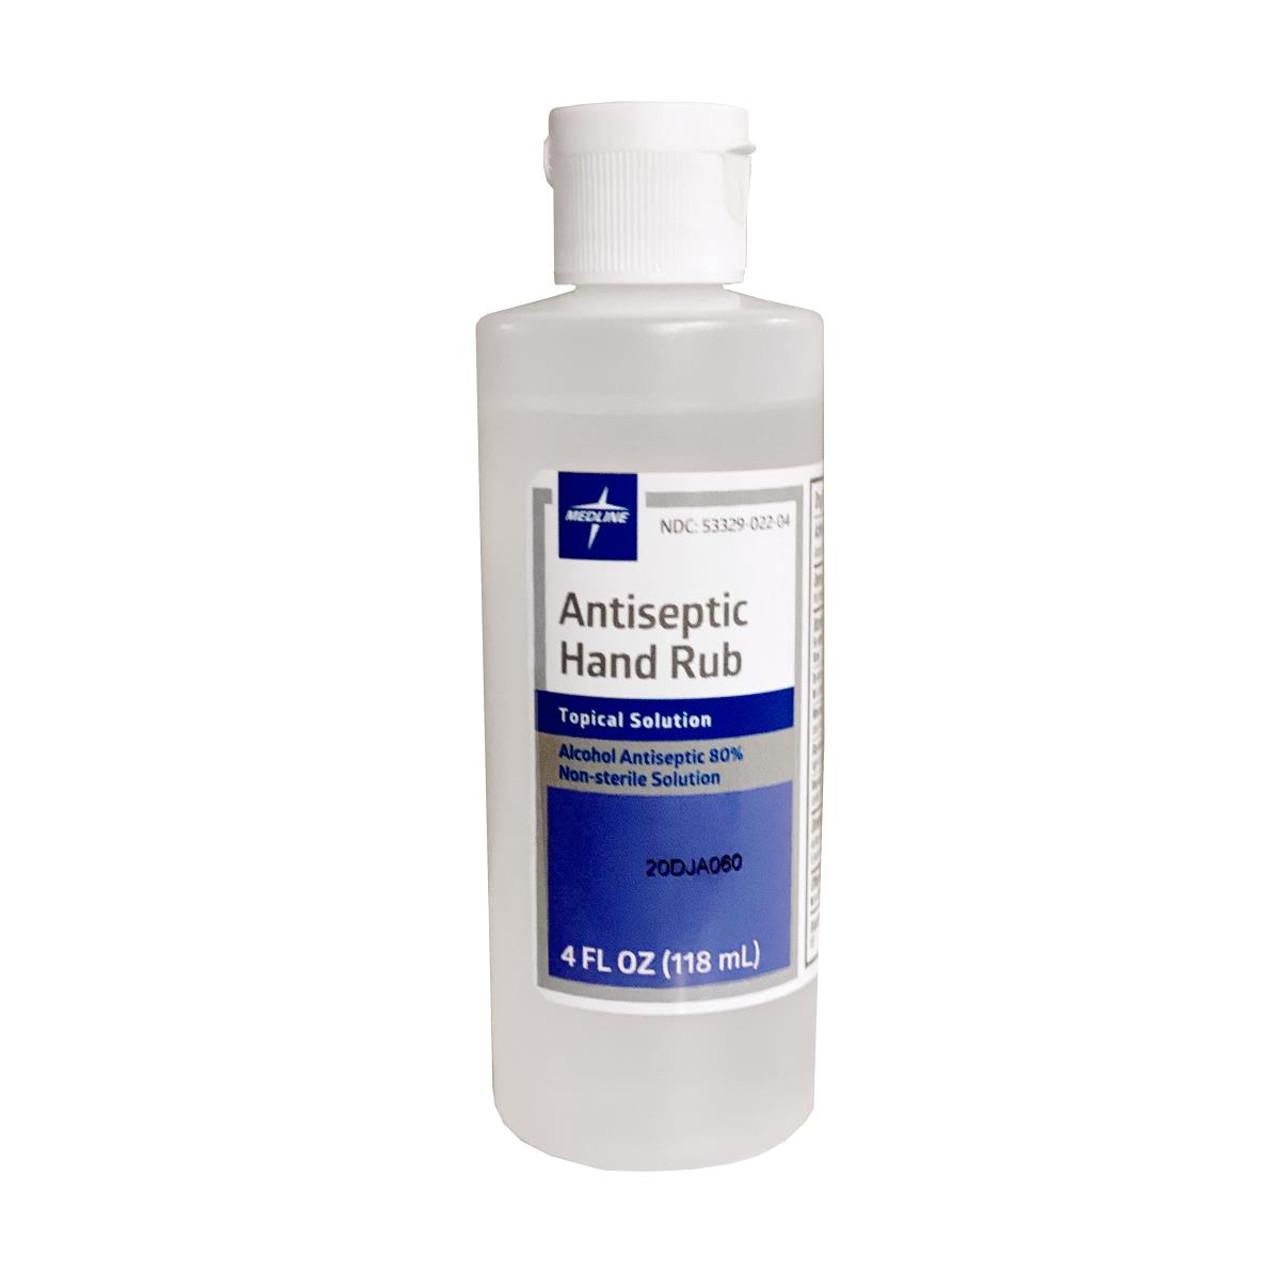 Alcohol Antiseptic Hand Rub - 4oz Squeeze Bottle